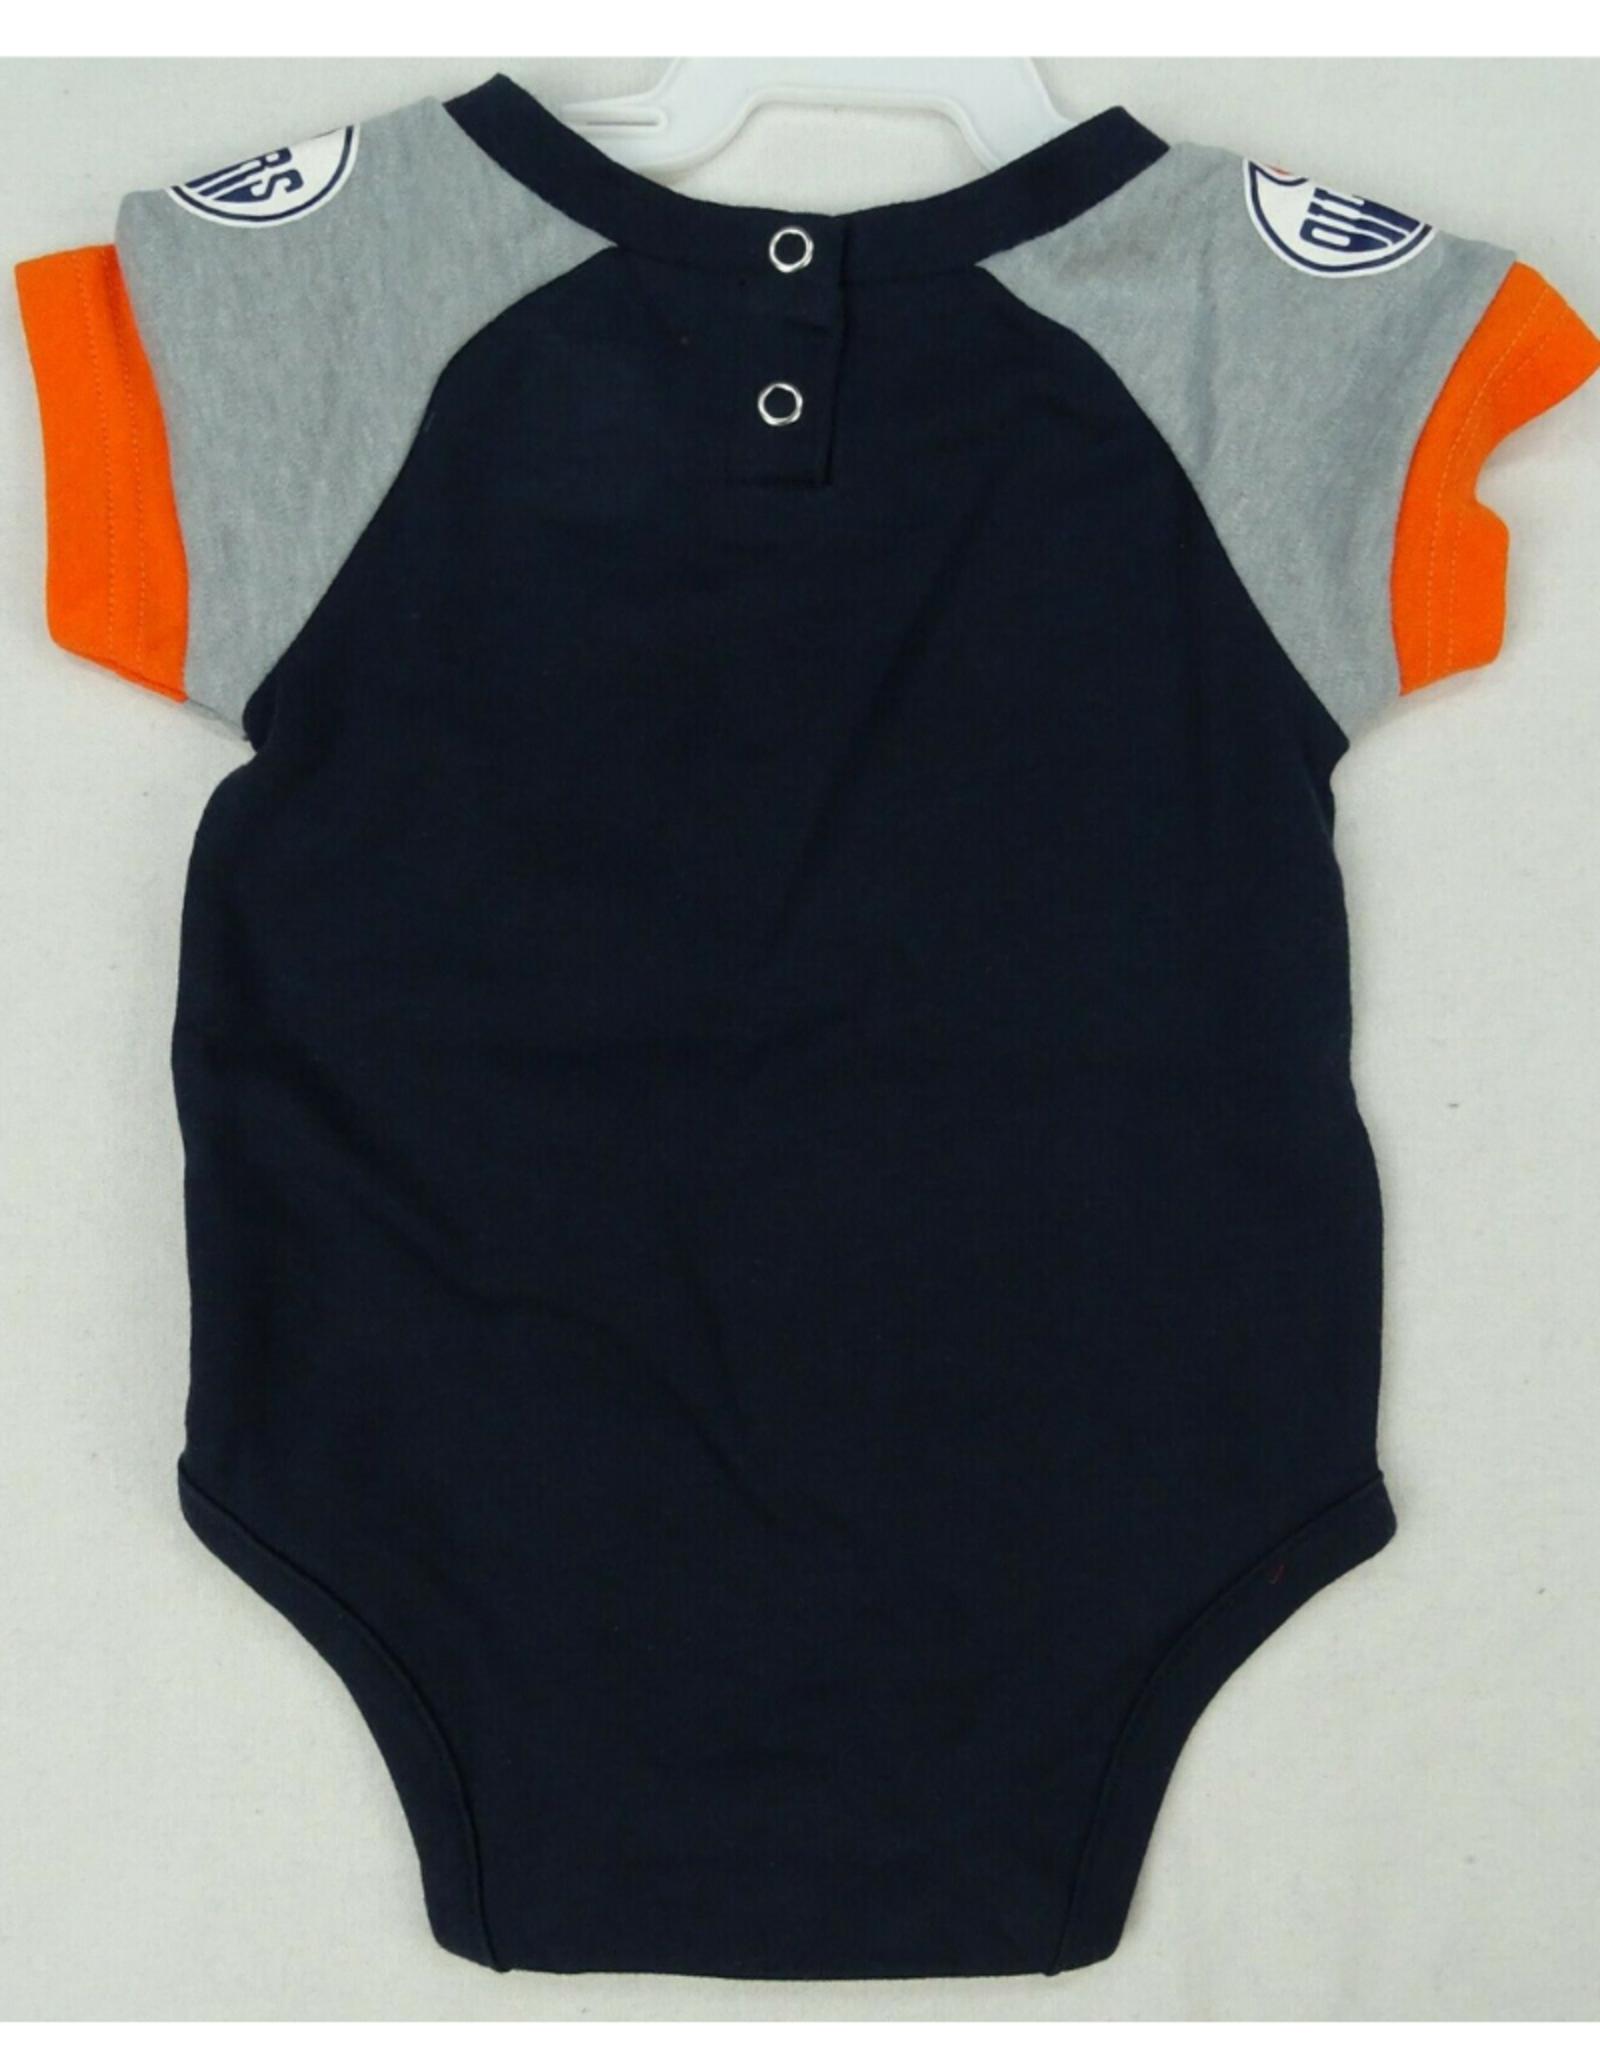 NHL Infant Blocker Diaper Shirt Bib and Booties set Edmonton Oilers